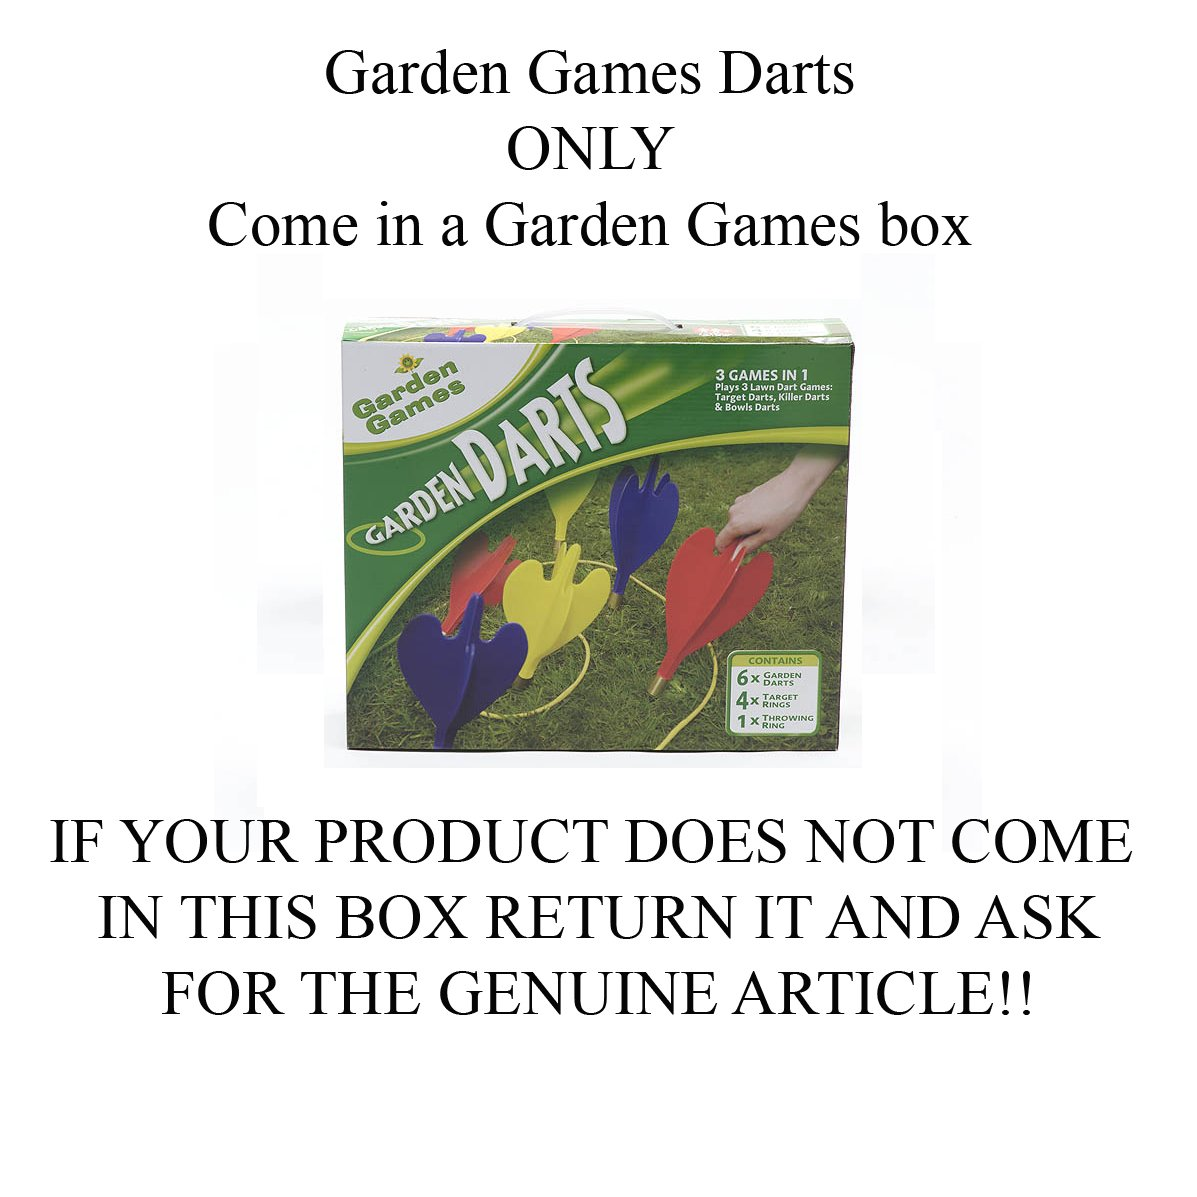 garden games giant garden darts 3 games in 1 amazon co uk toys